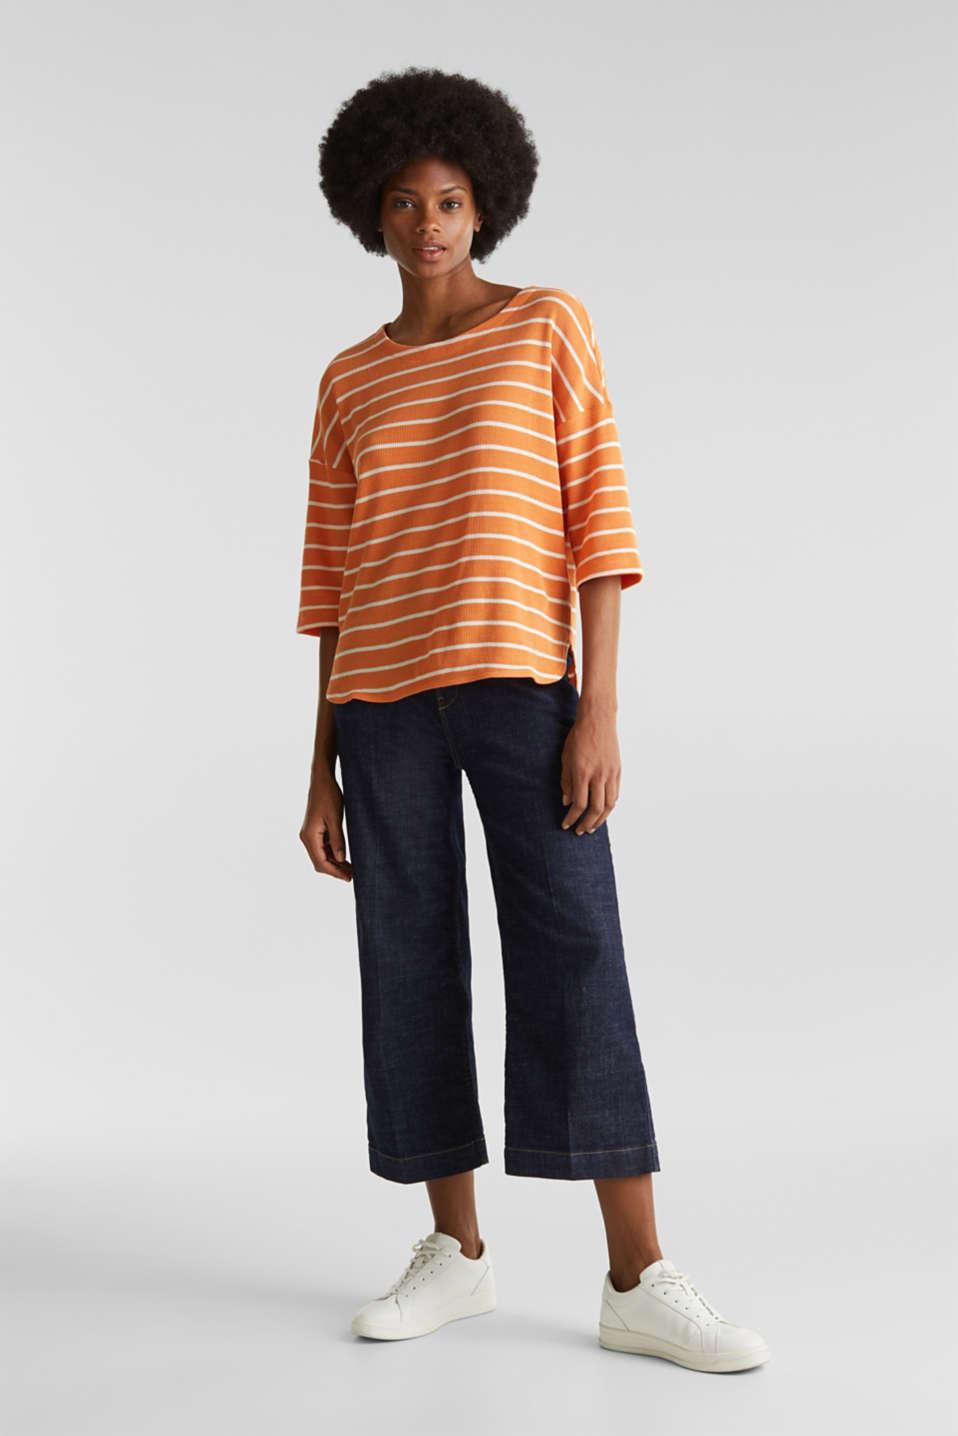 Piqué T-shirt in 100% cotton, RUST ORANGE, detail image number 1